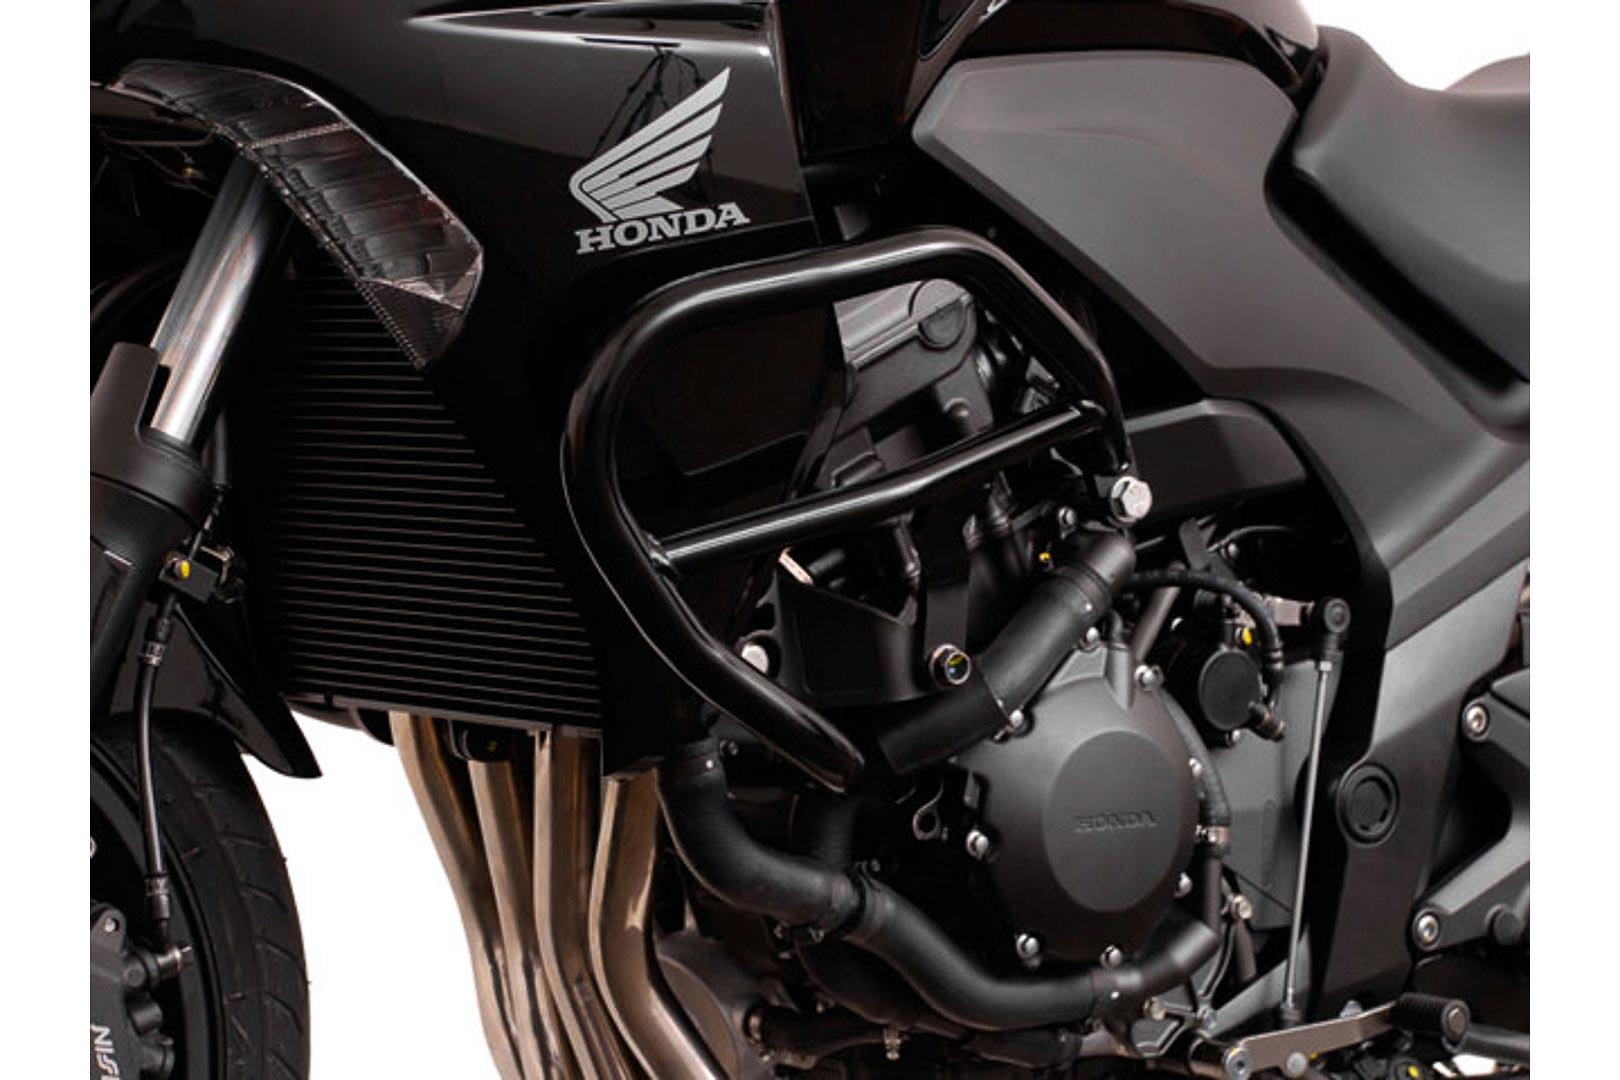 SW-Motech Moottorinsuojarauta Honda CBF1000F 10-, musta